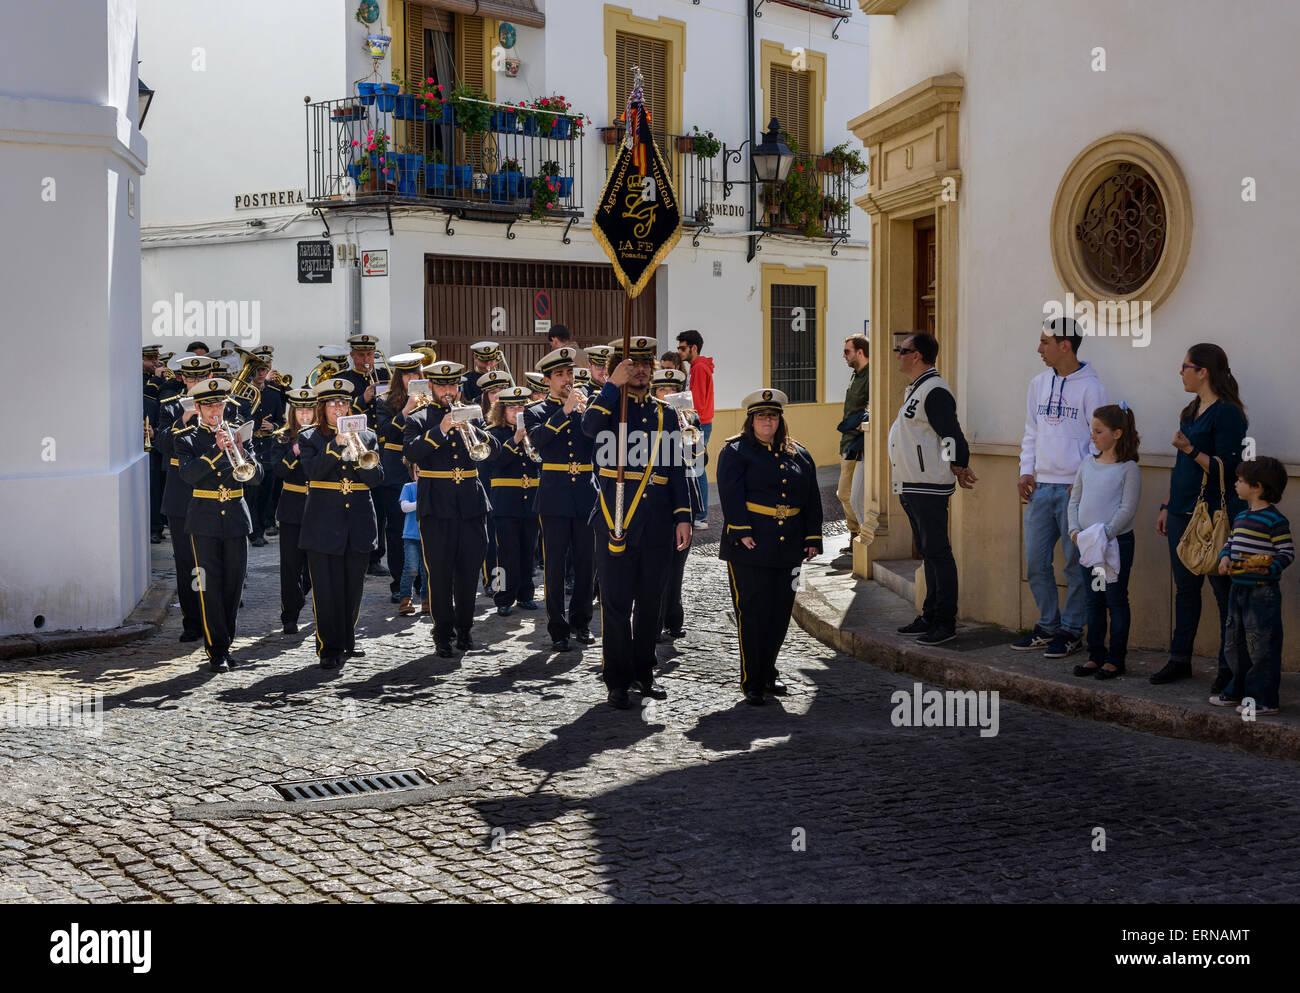 Marching Band a Cordoba Spagna Immagini Stock